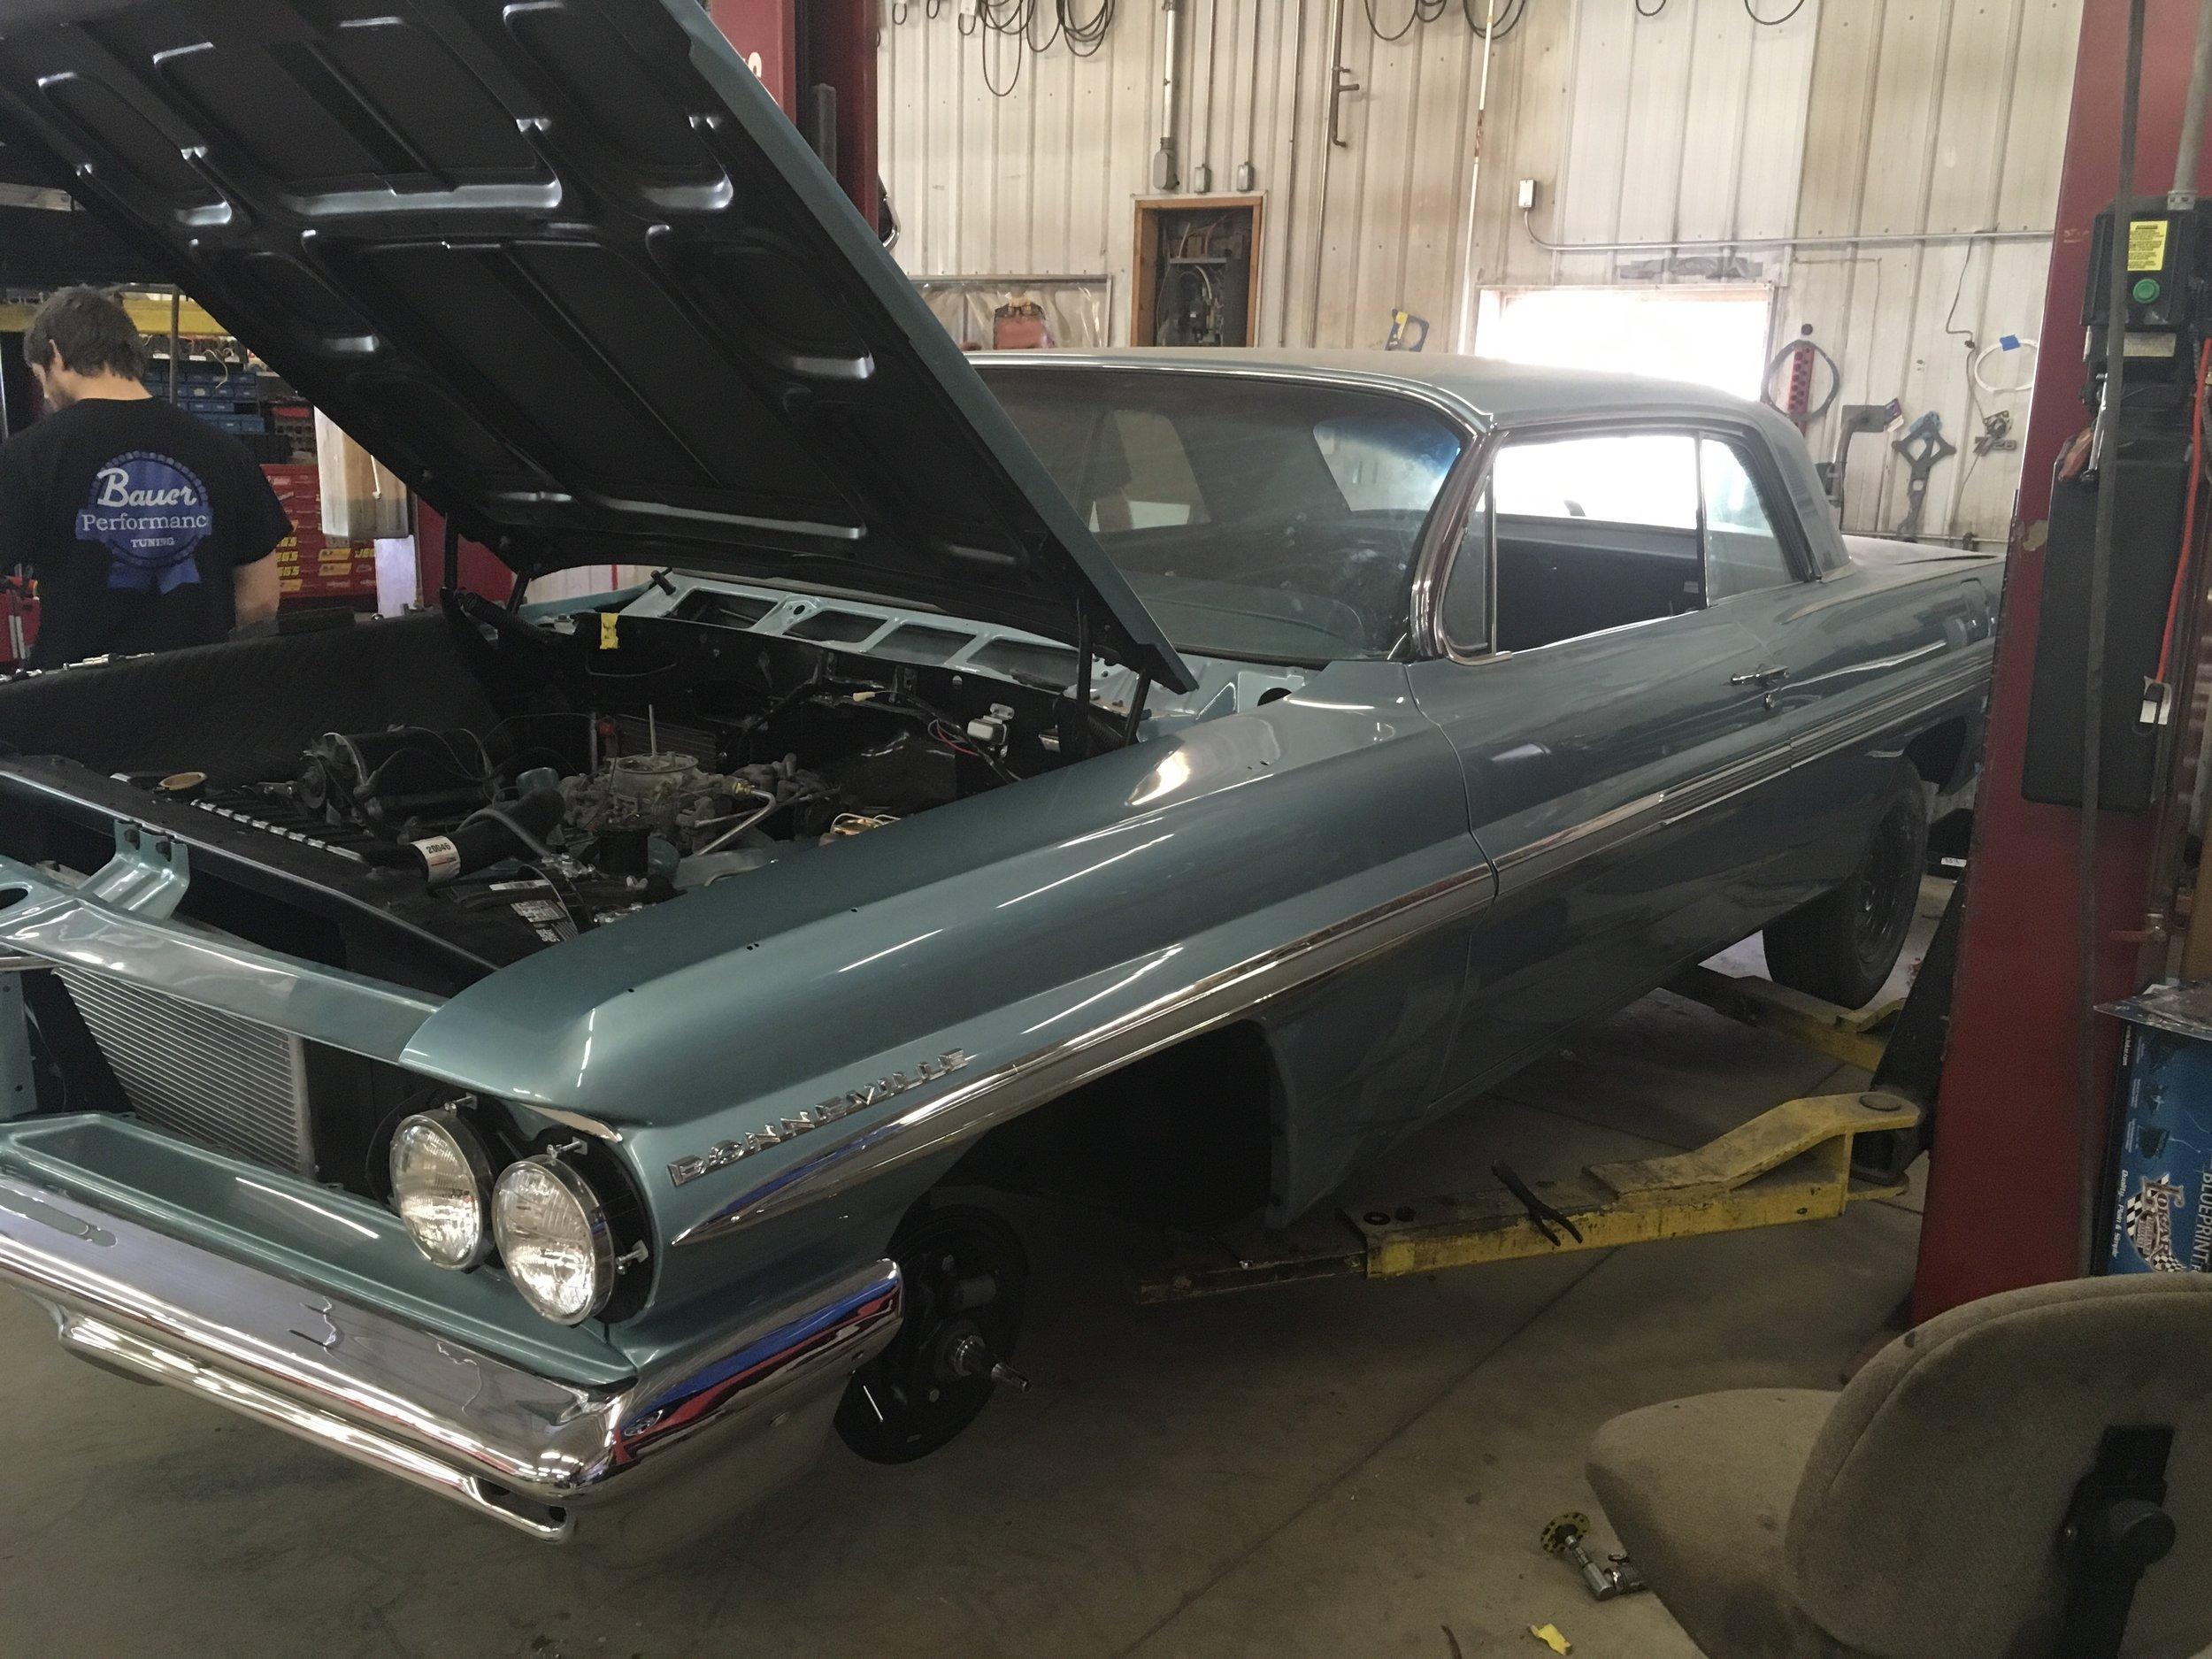 1962-Pontiac-Bonneville-minneapolis-hot-rod-custom-build-restoration.jpg